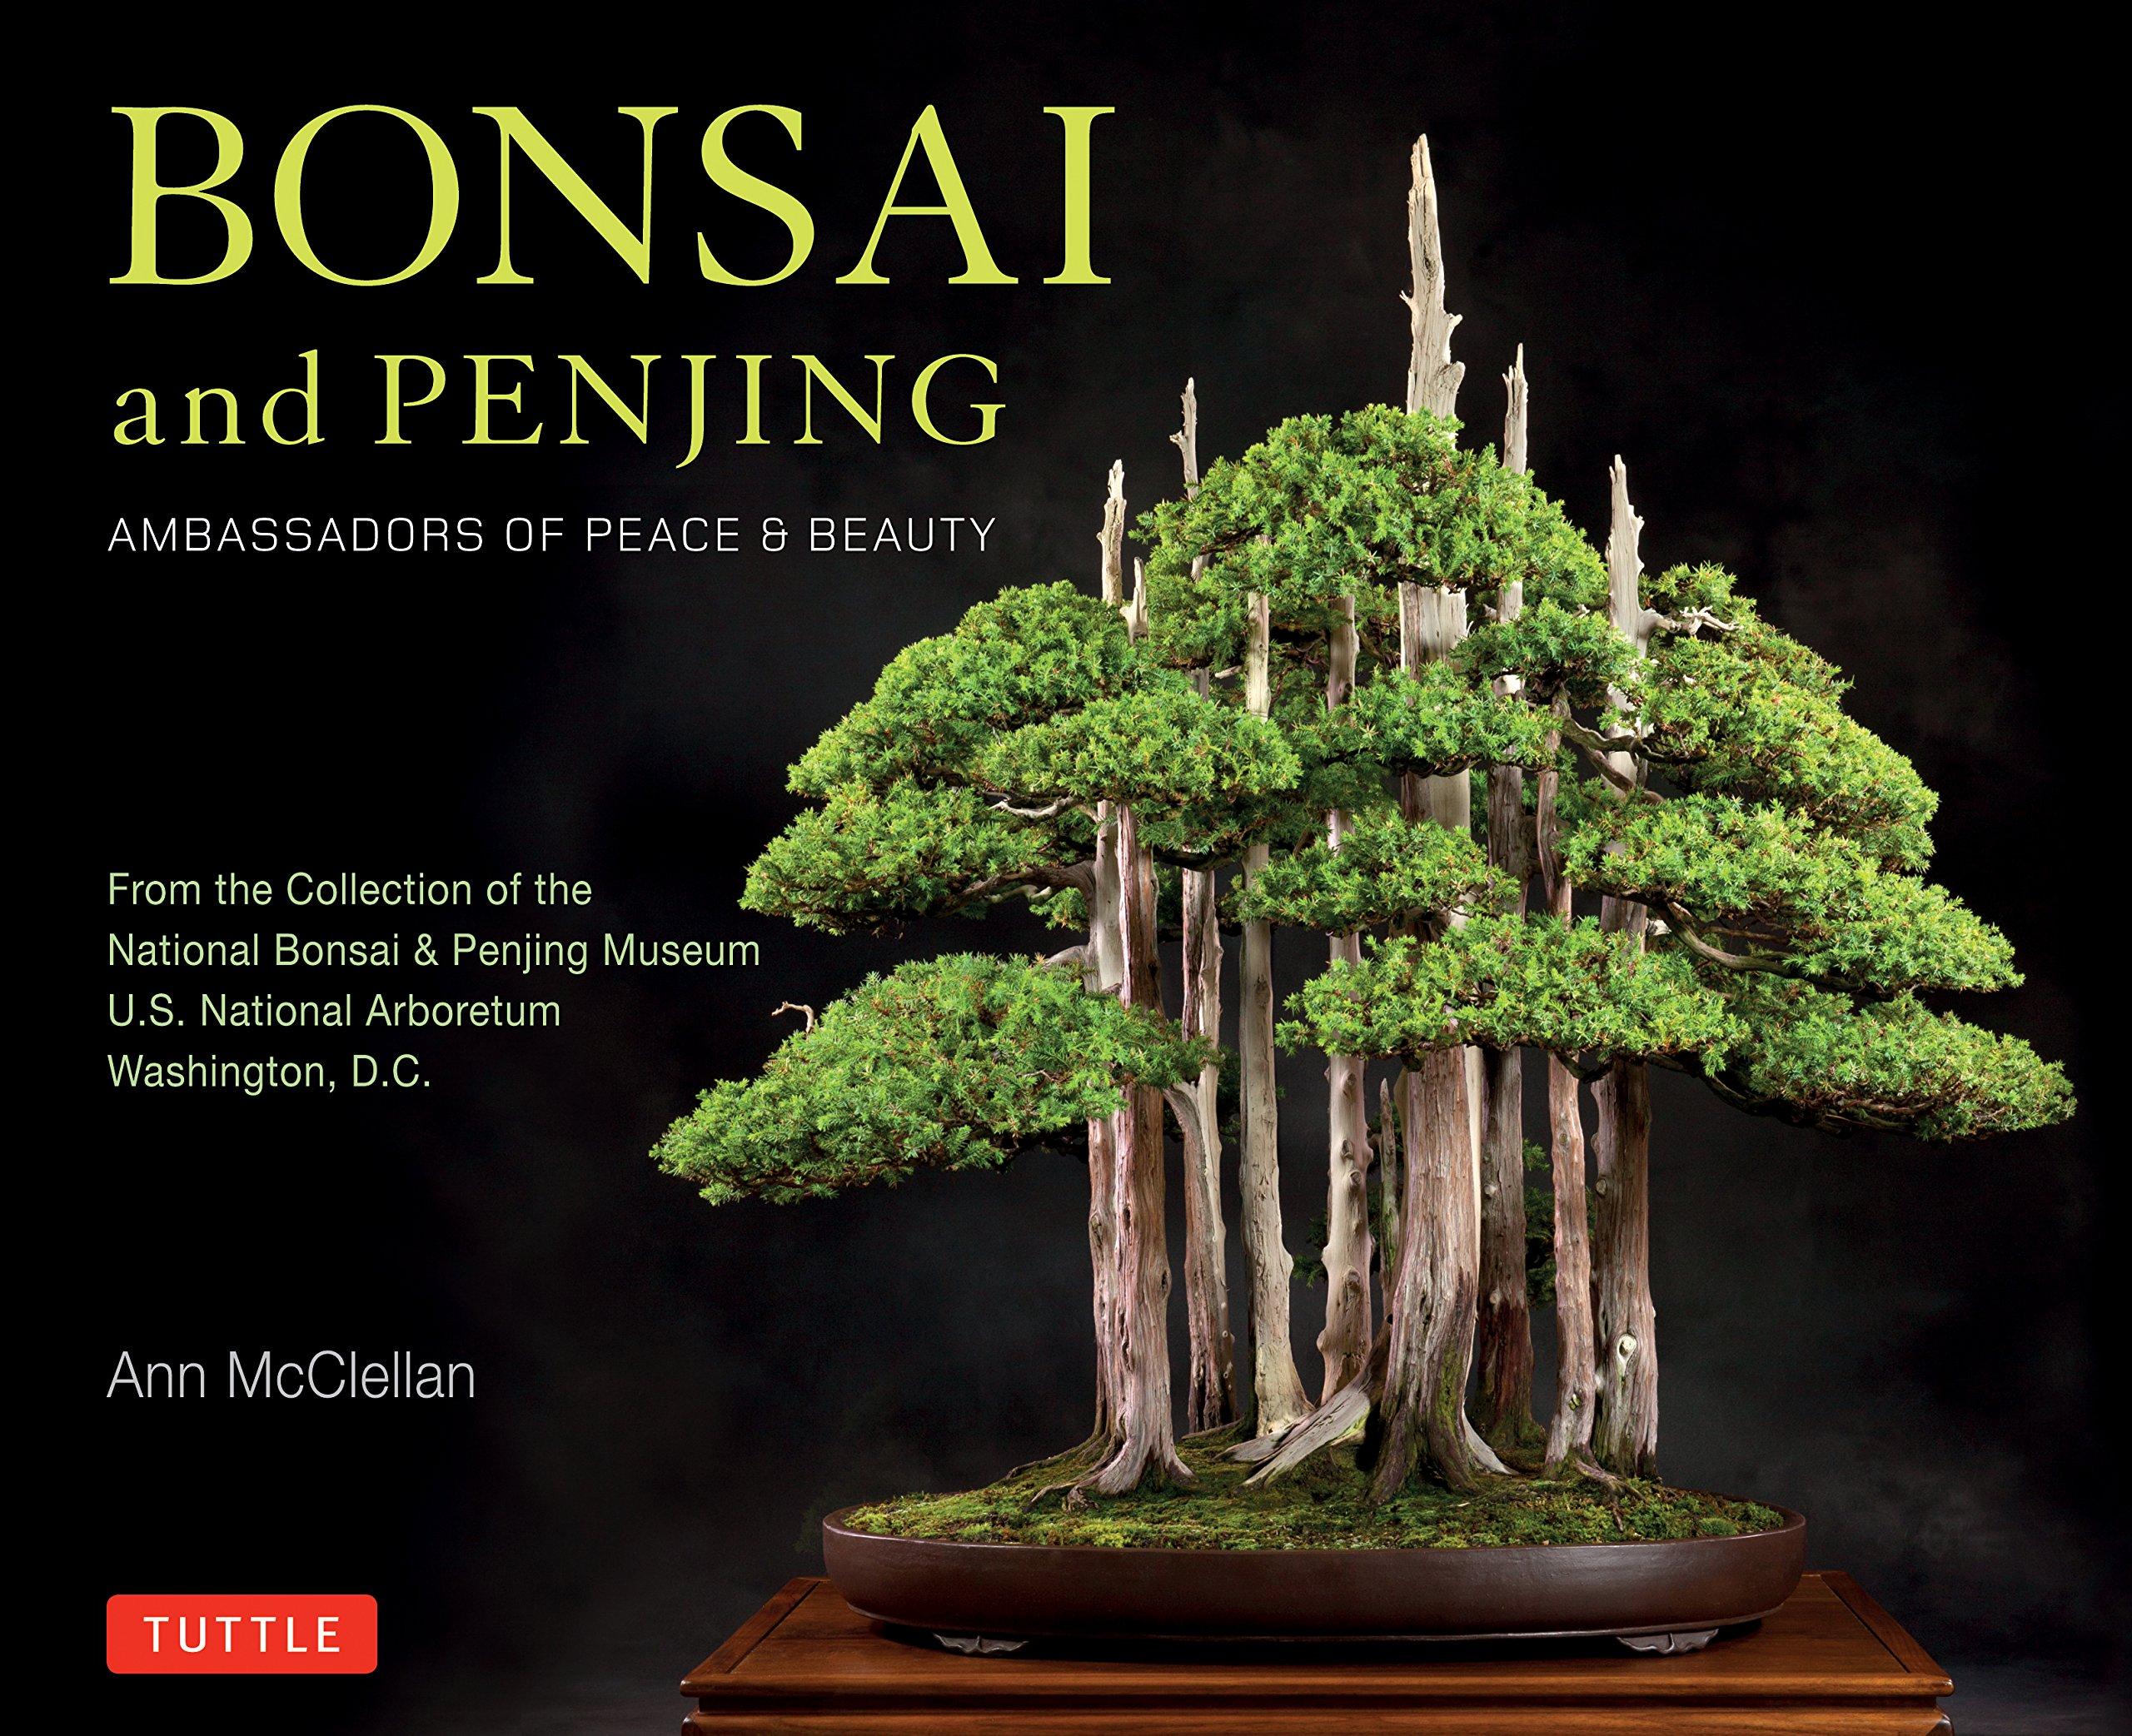 Bonsai and Penjing: Ambassadors of Peace & Beauty